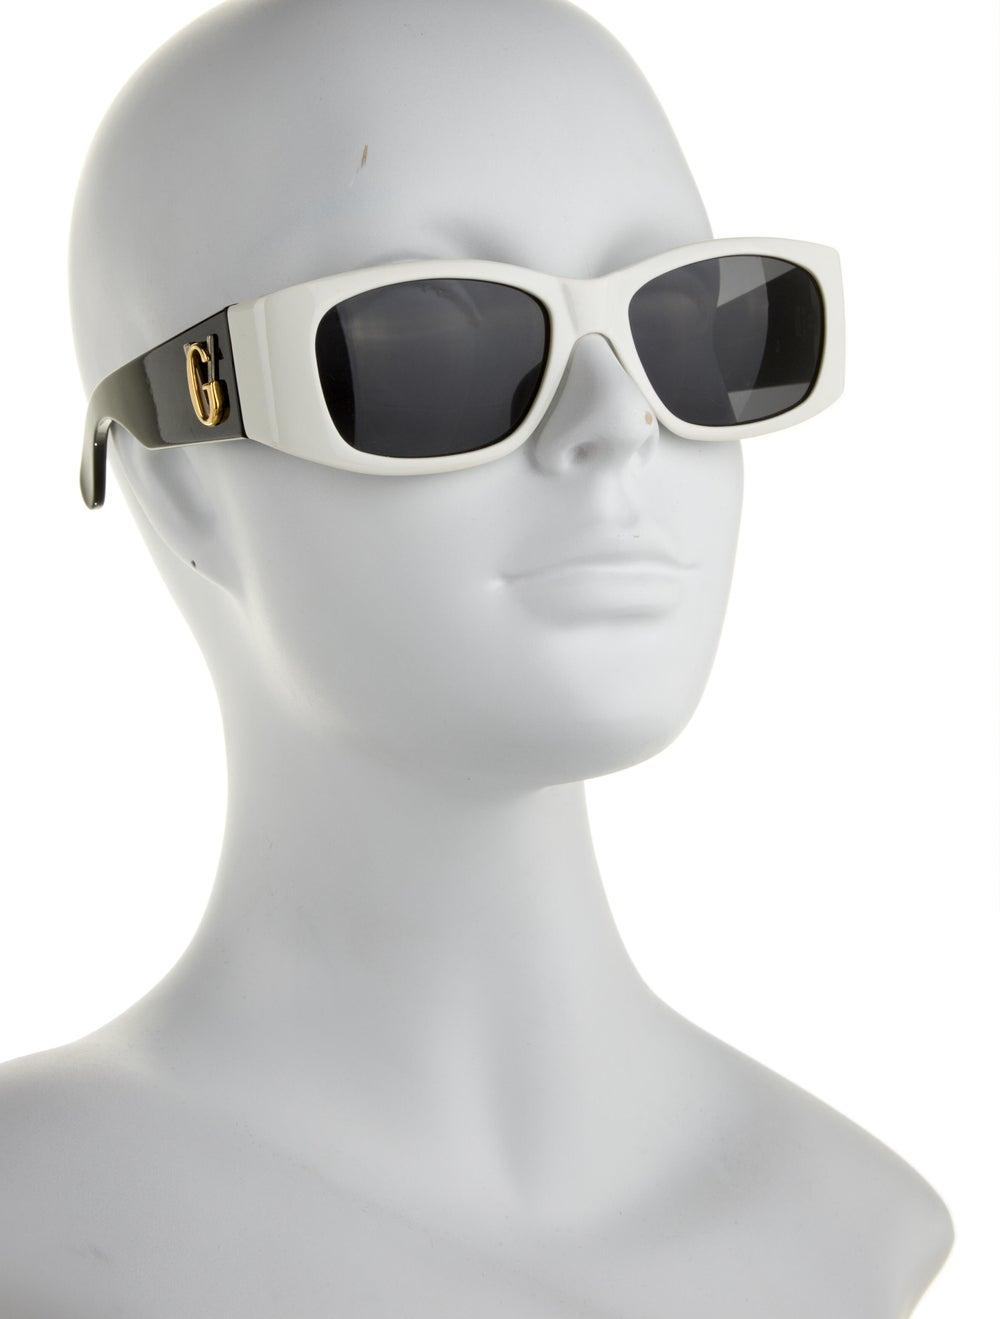 Gianni Versace Square Tinted Sunglasses Black - image 4